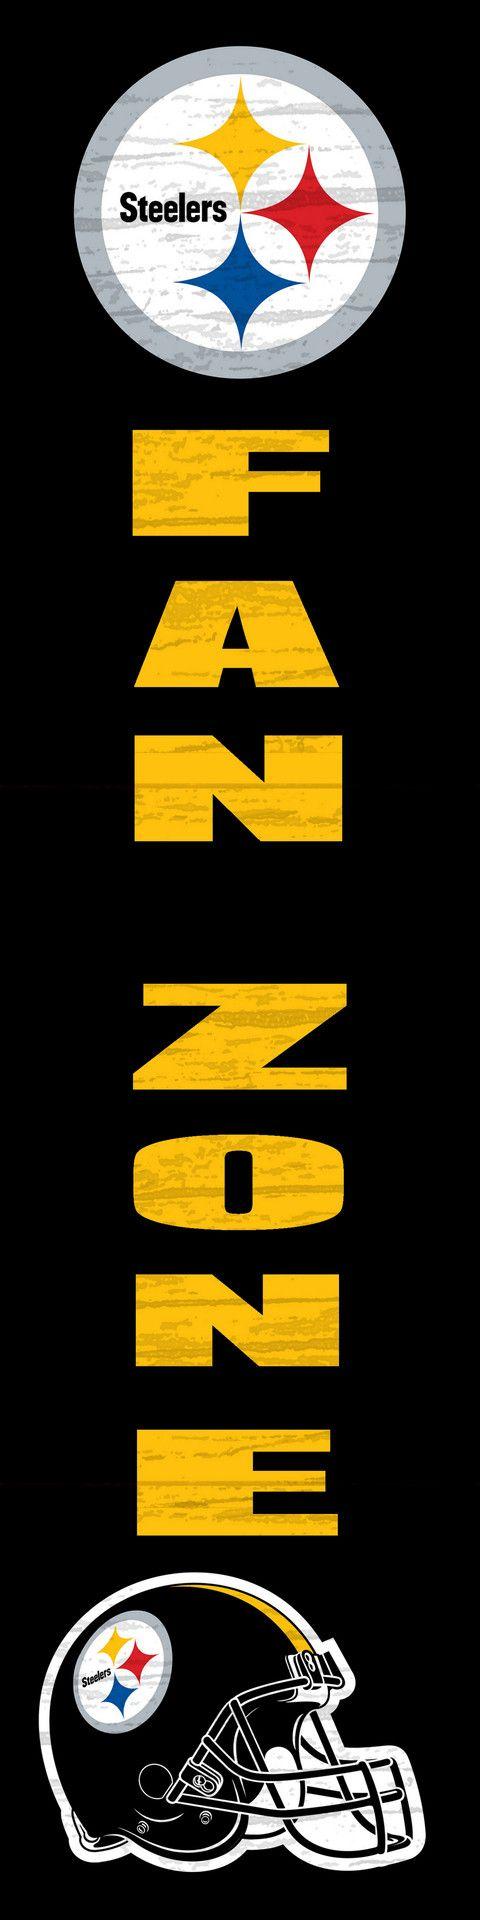 7 best Pittsburgh Steelers images on Pinterest | Steelers stuff ...